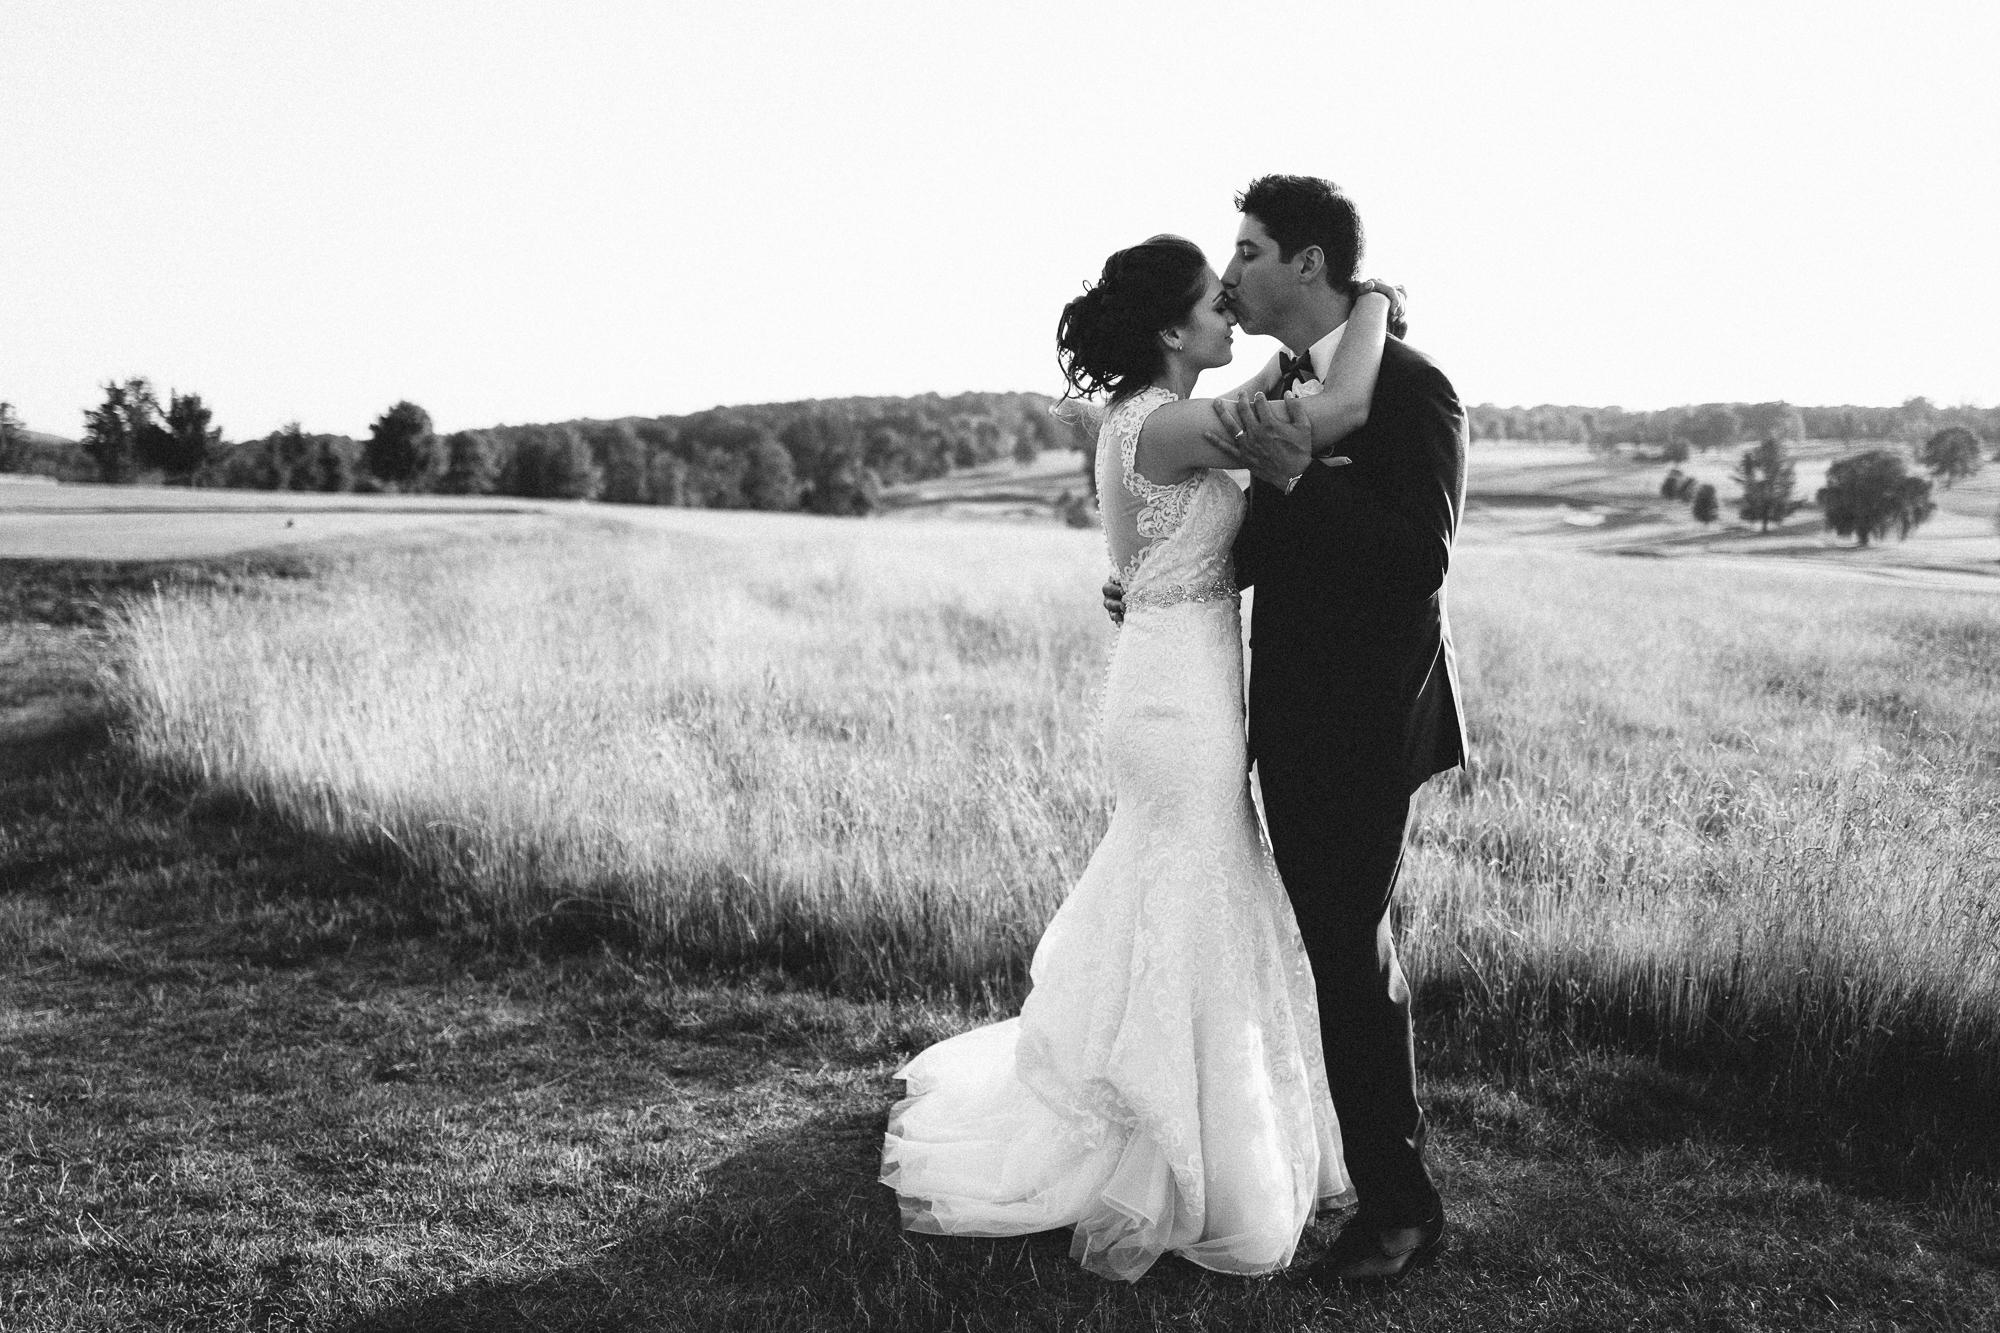 scranton-wedding-photography-zak-zavada-2016.06-rebeccaIan-0838.jpg